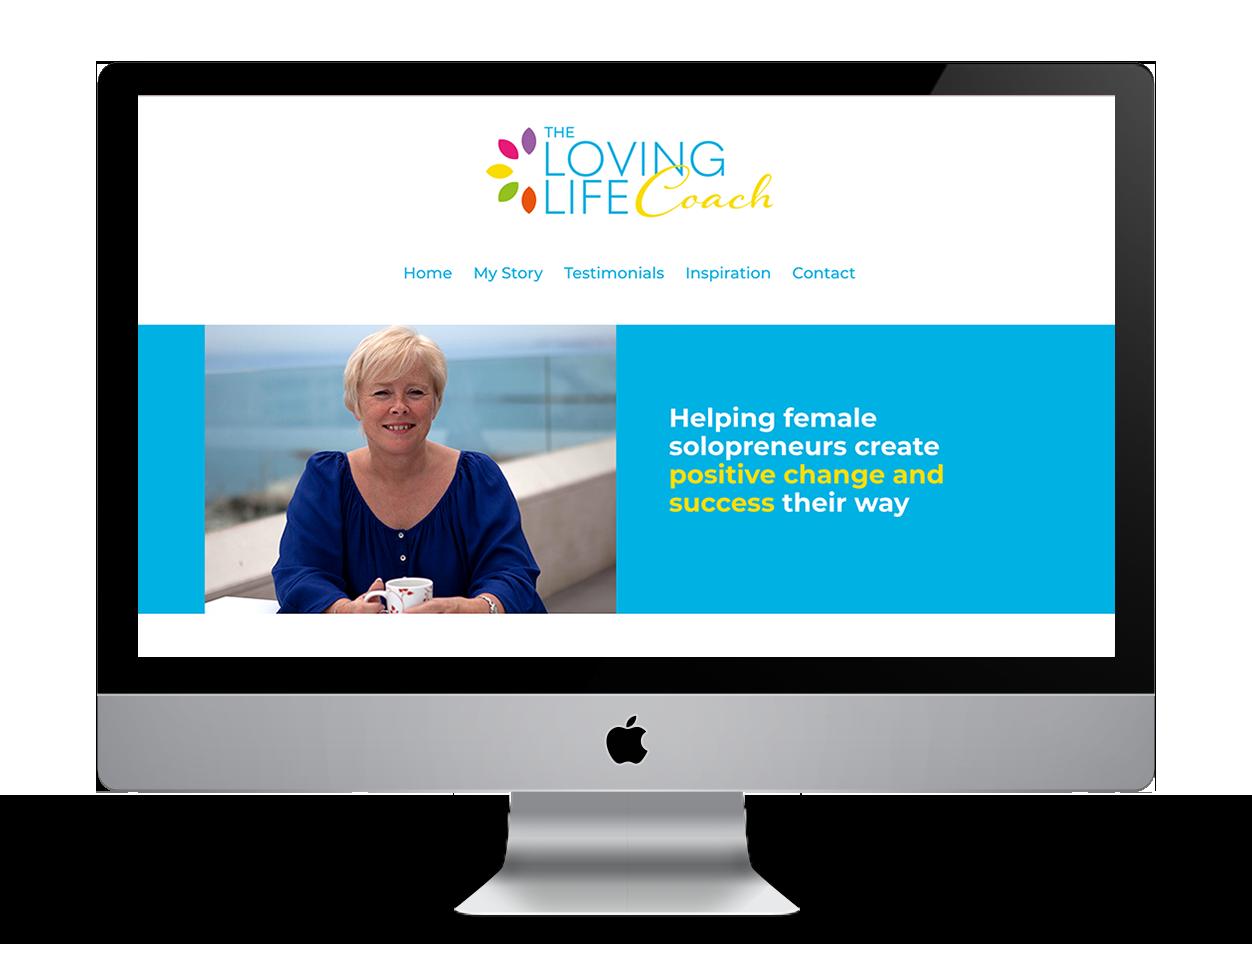 The Loving Life Coach branding board